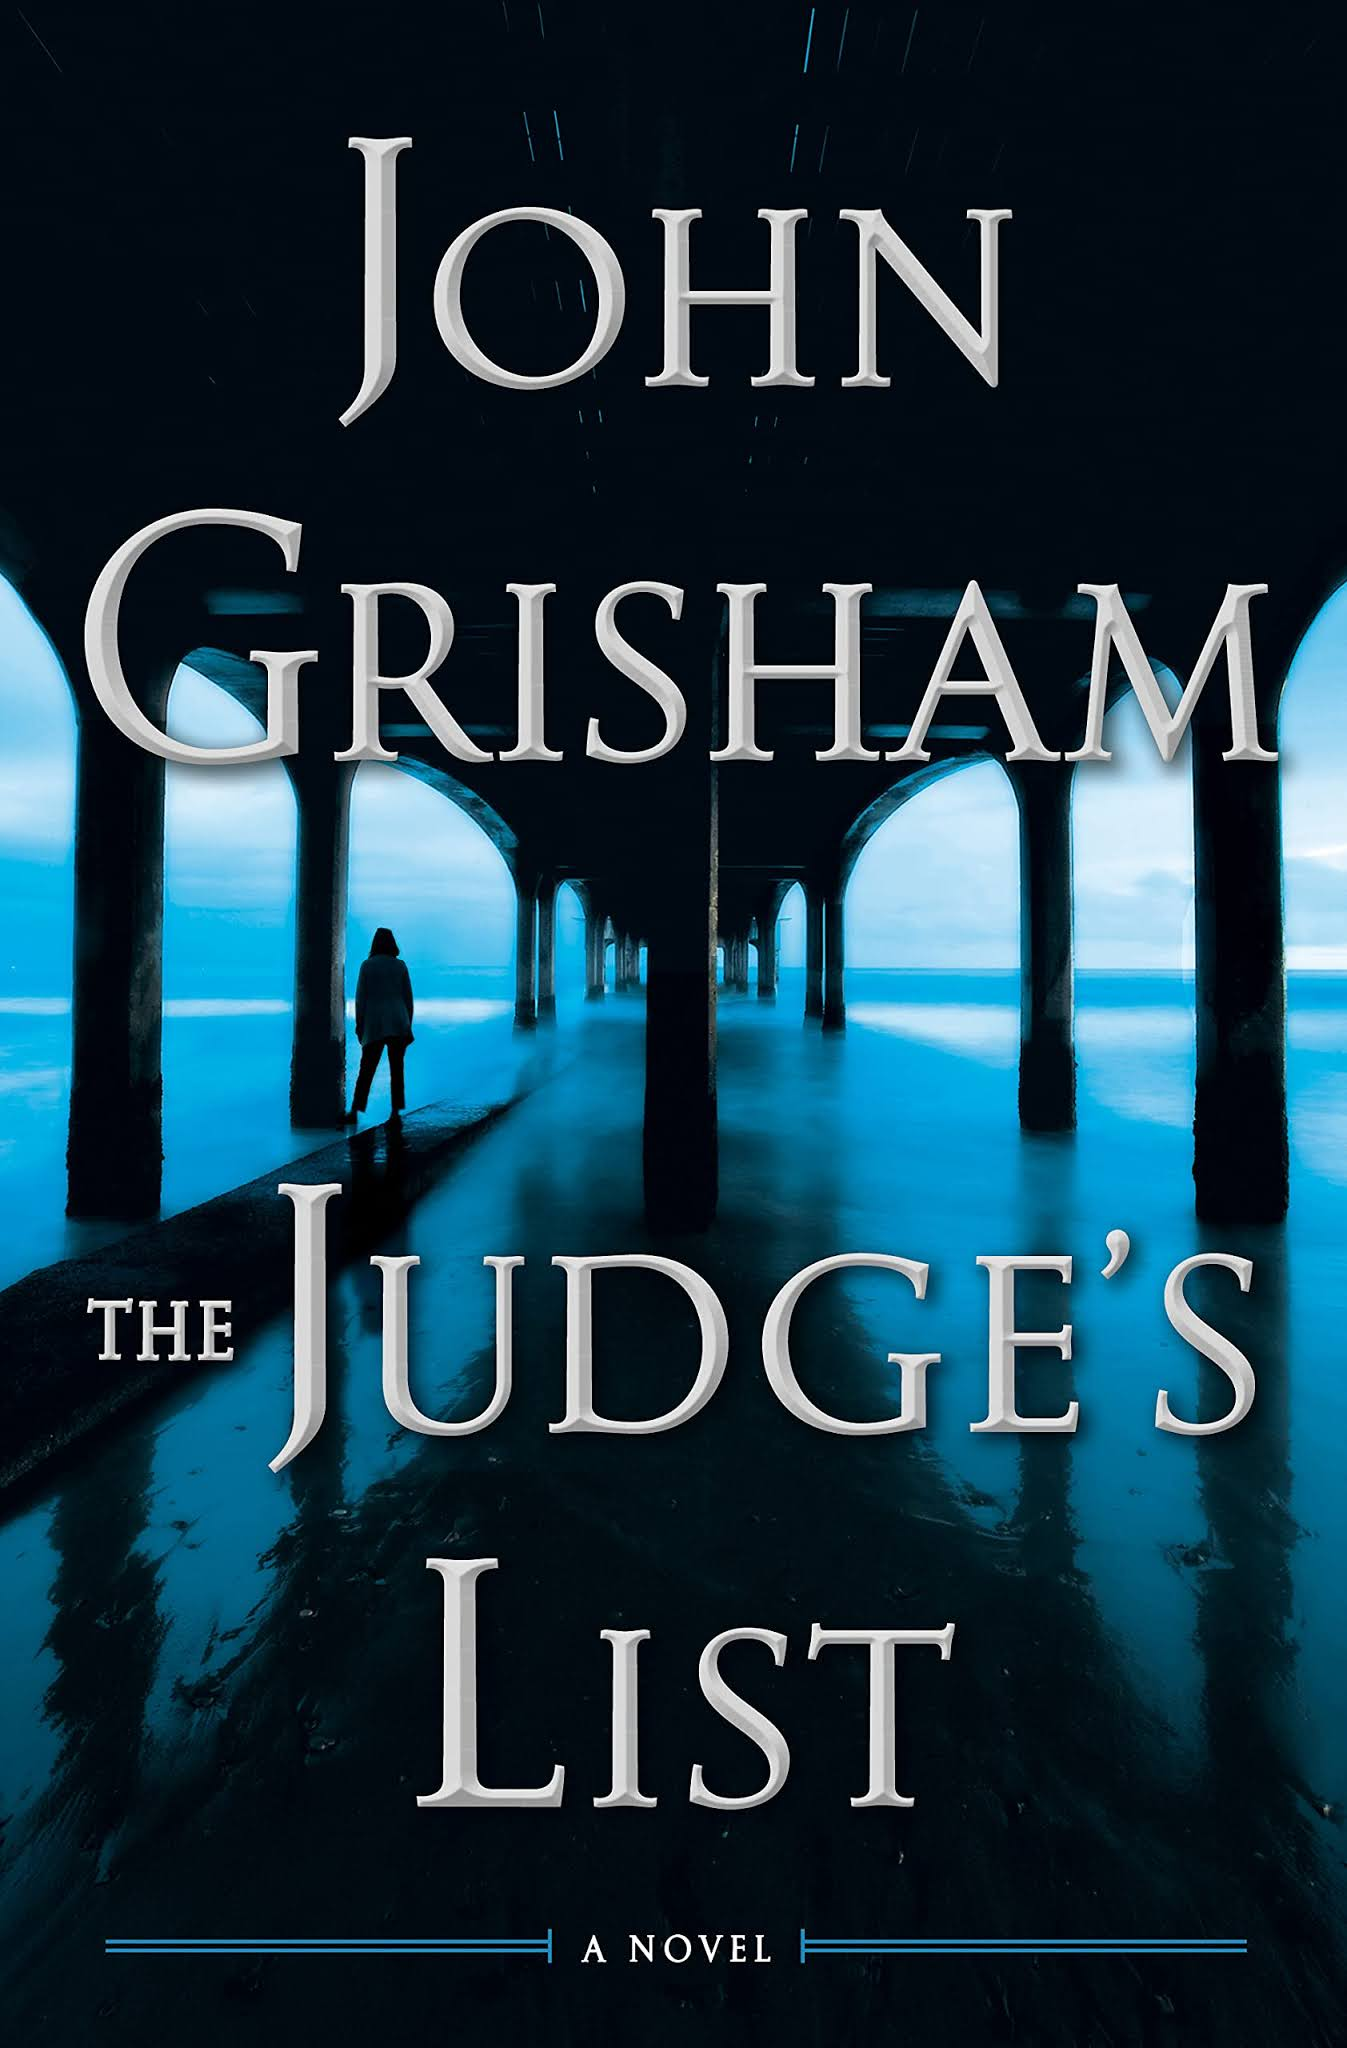 The Judge's List by John Grisham